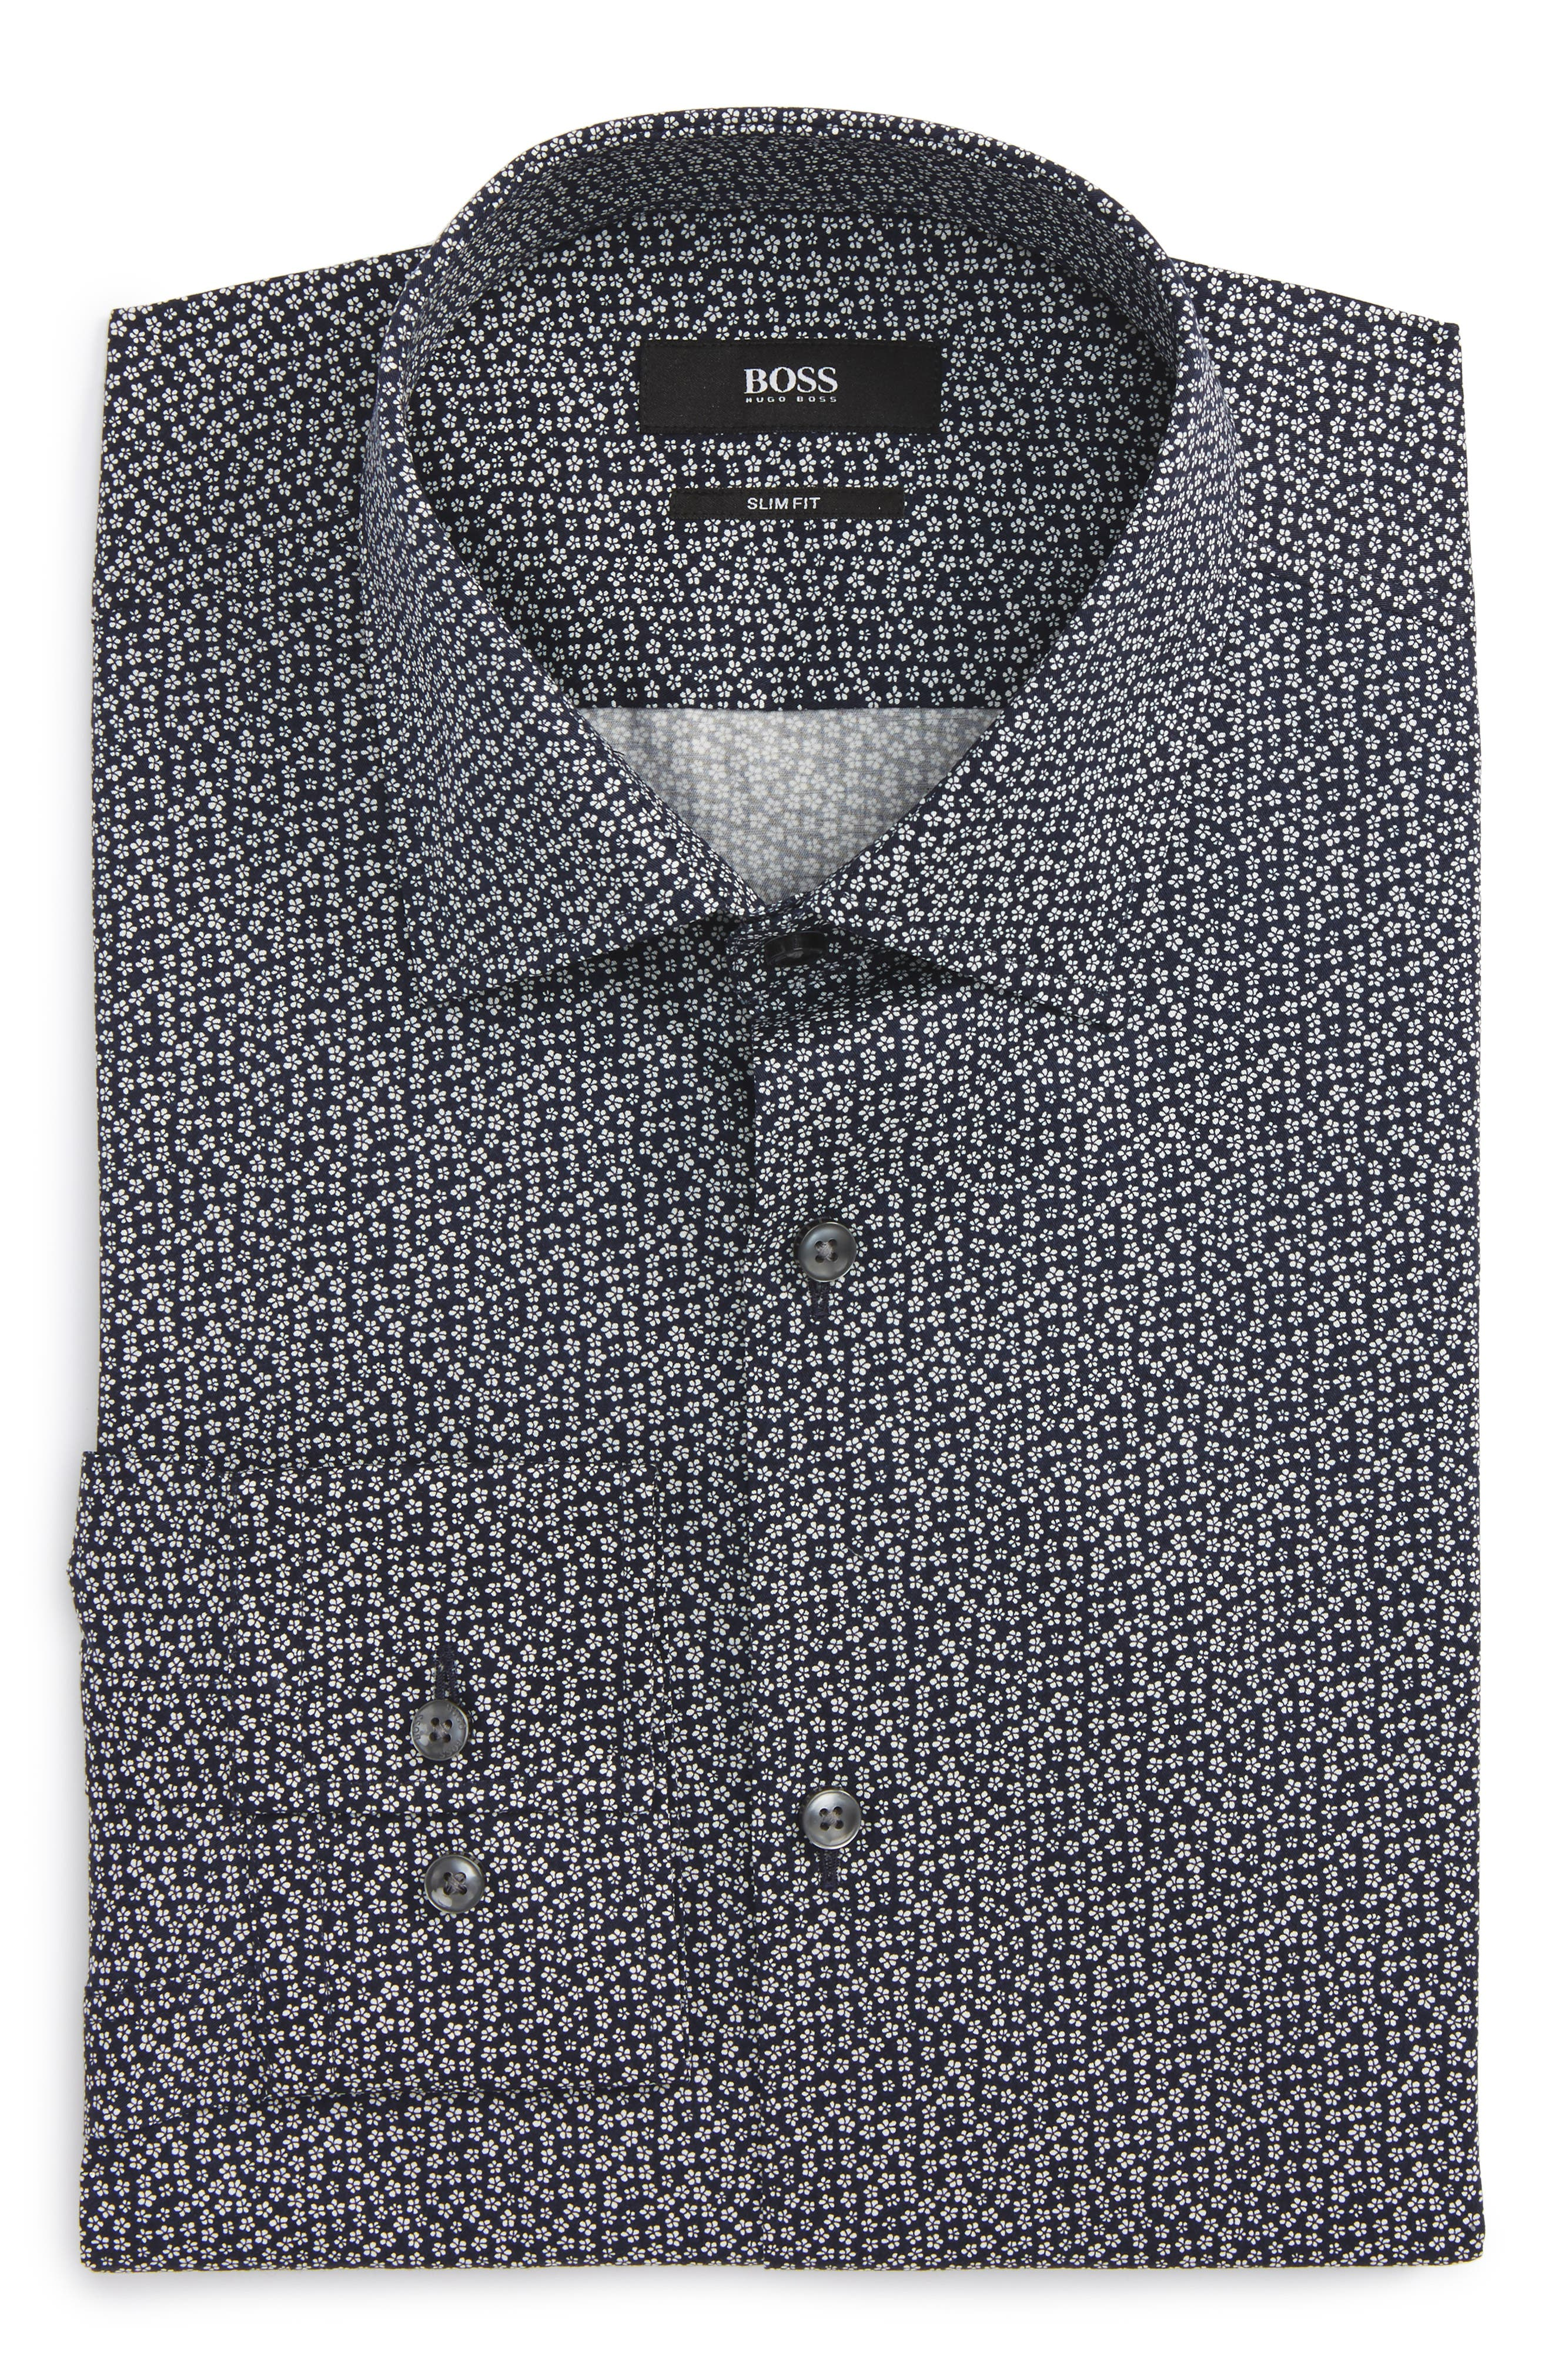 Alternate Image 1 Selected - BOSS Slim Fit Floral Dress Shirt